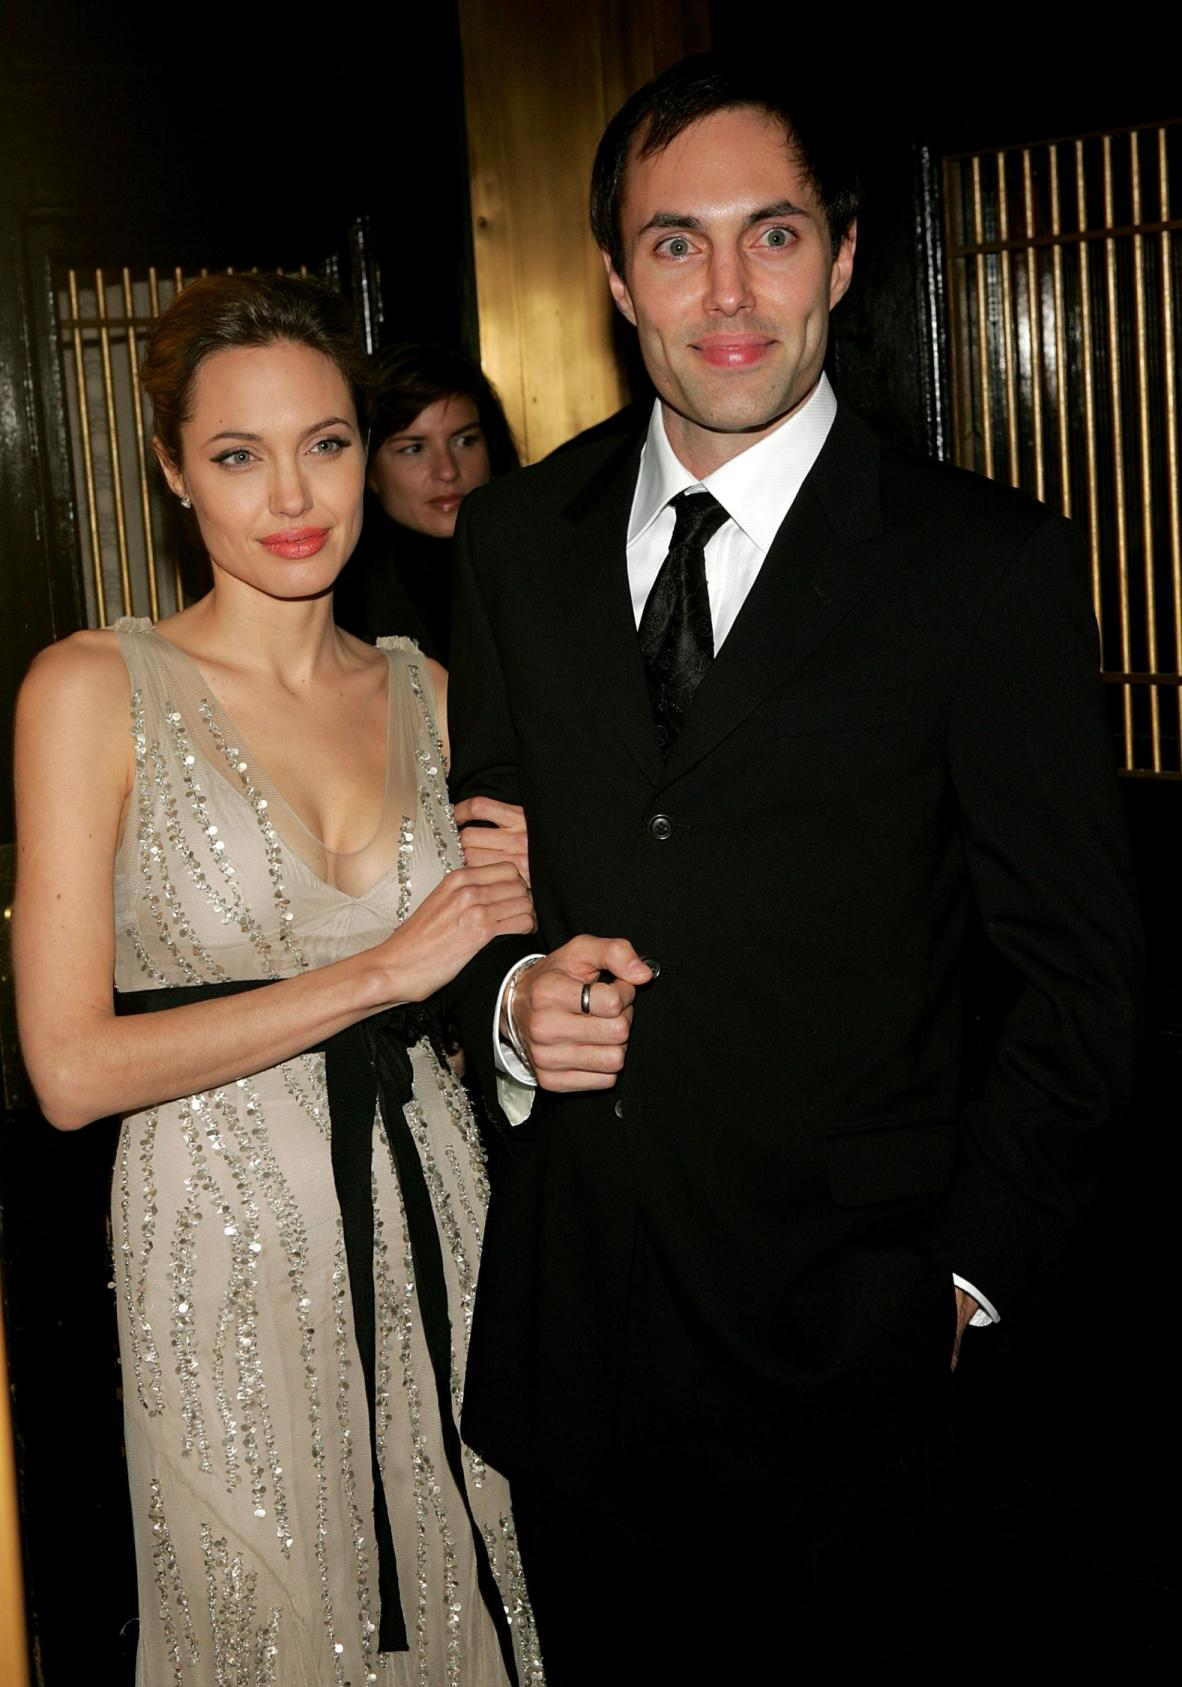 Angelina Jolie Cyborg 2 1993 angie's rainbow : angelina jolie's biography